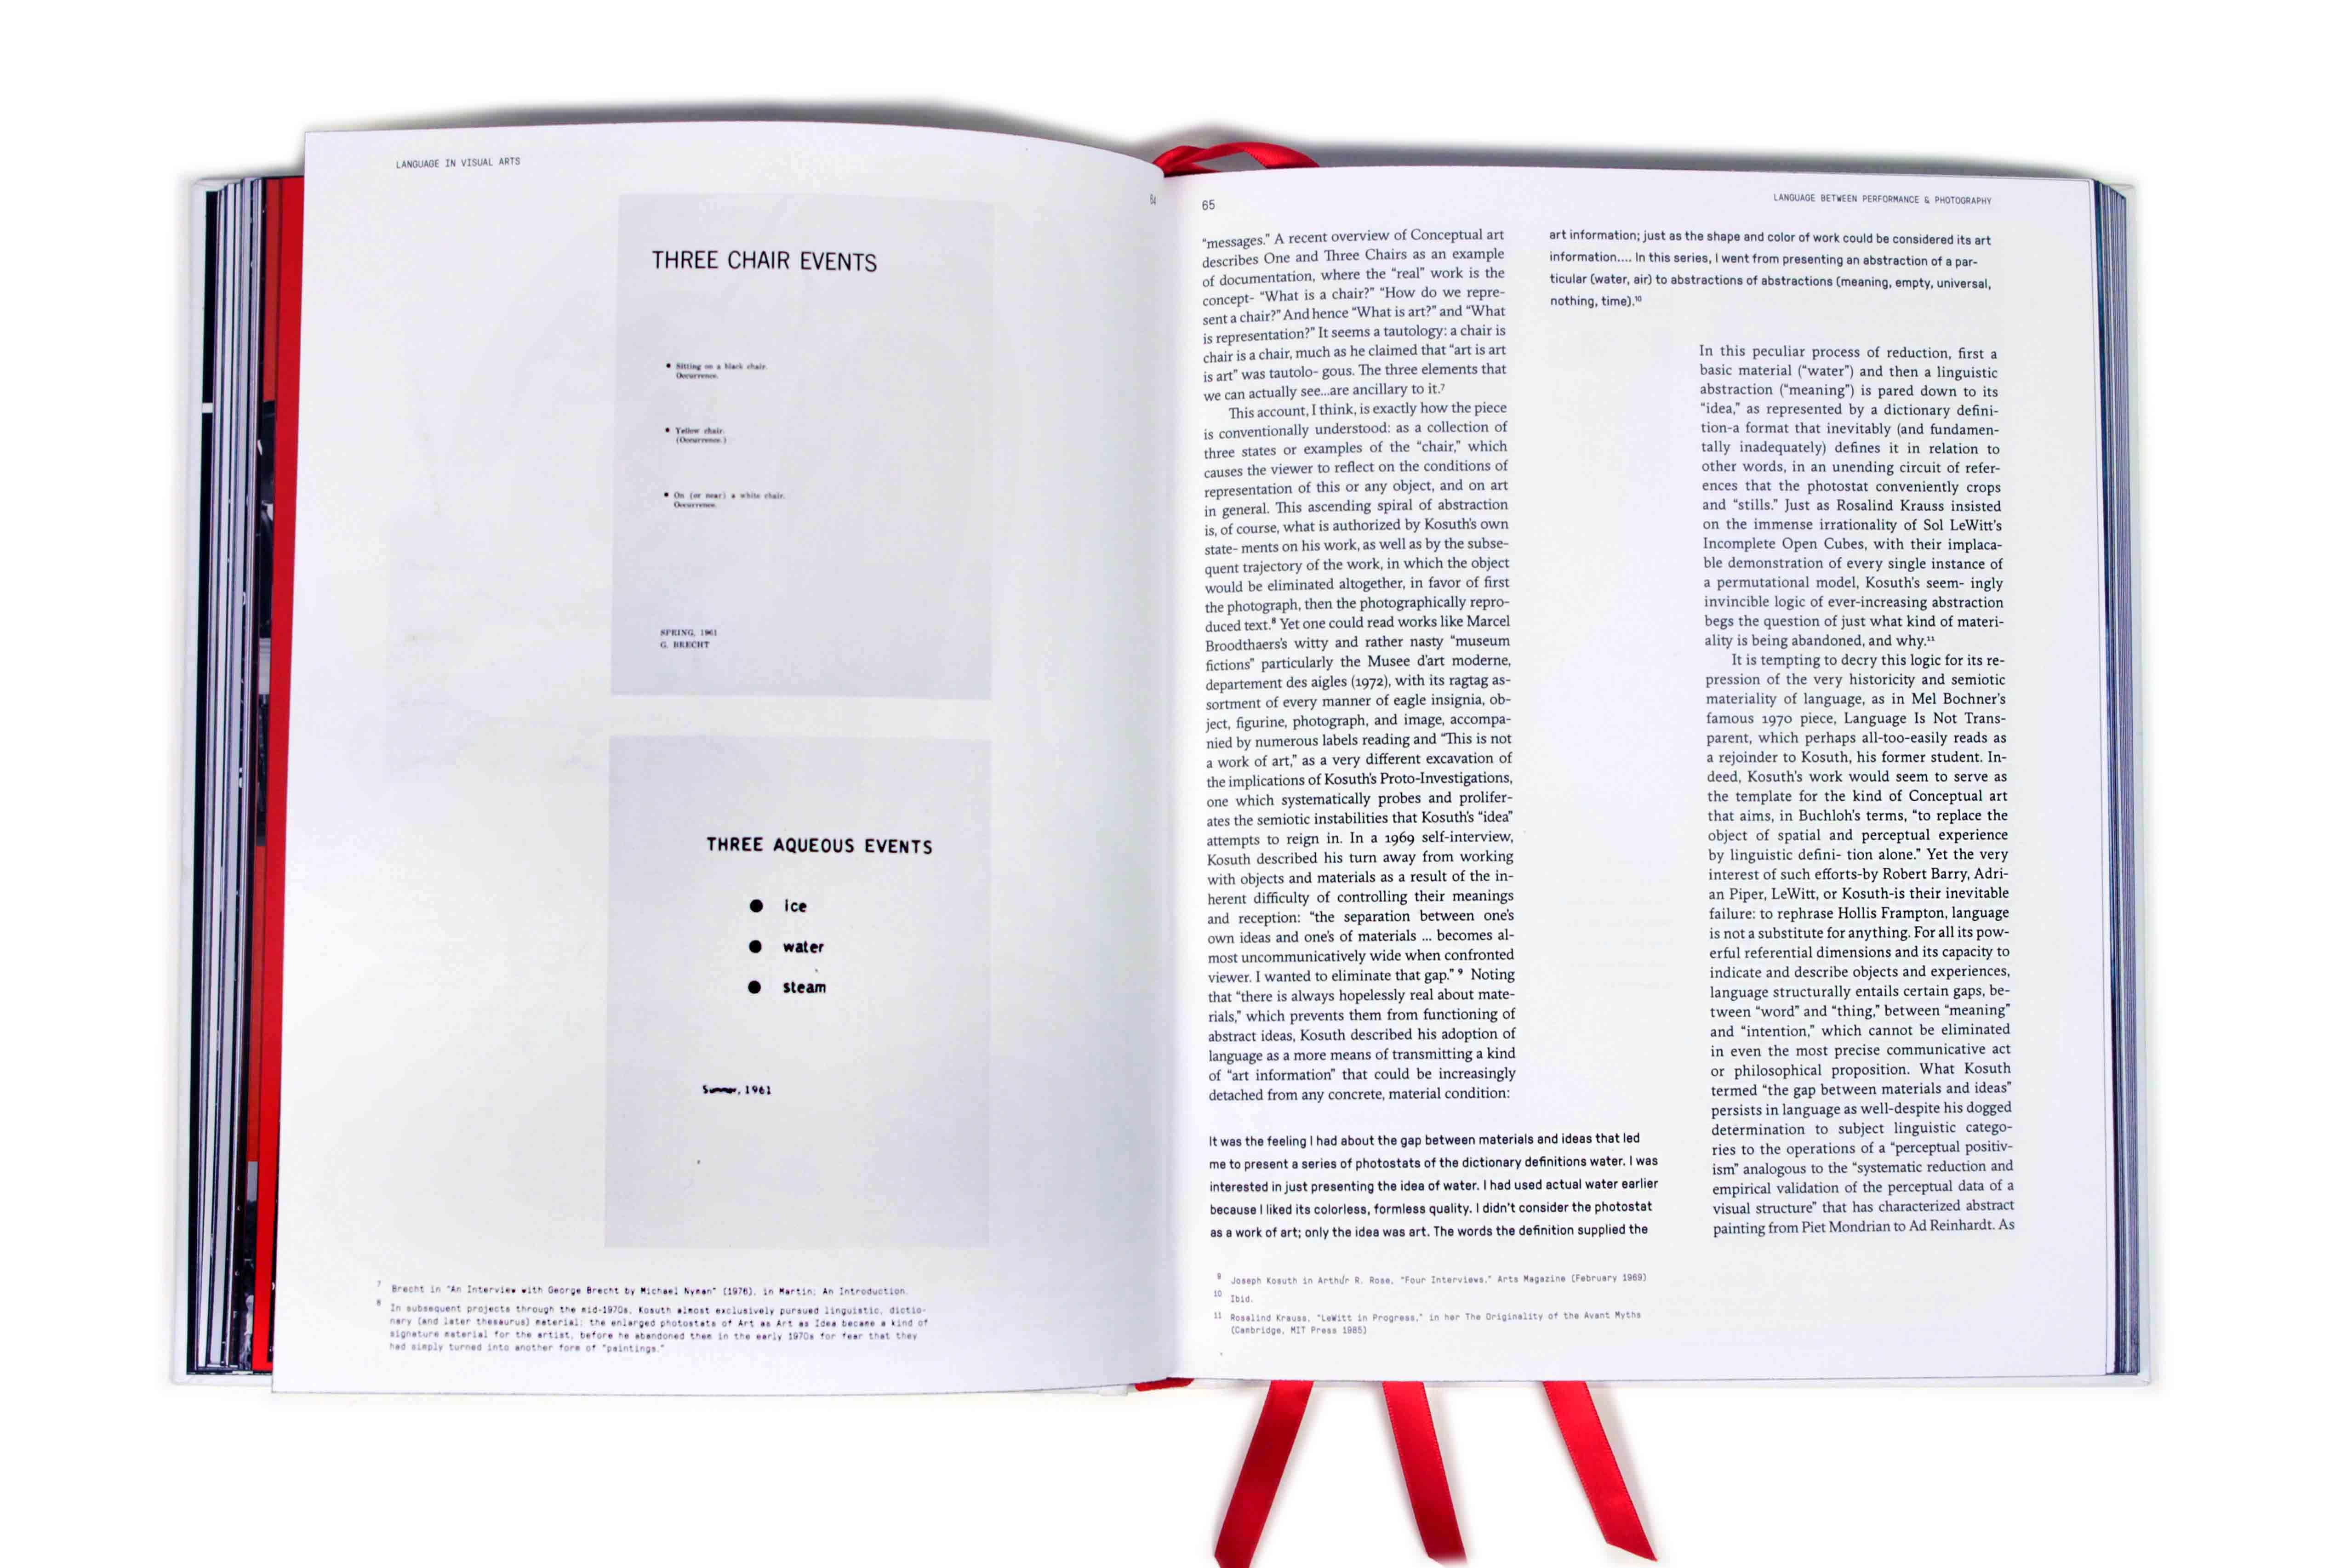 book_24-2 copy